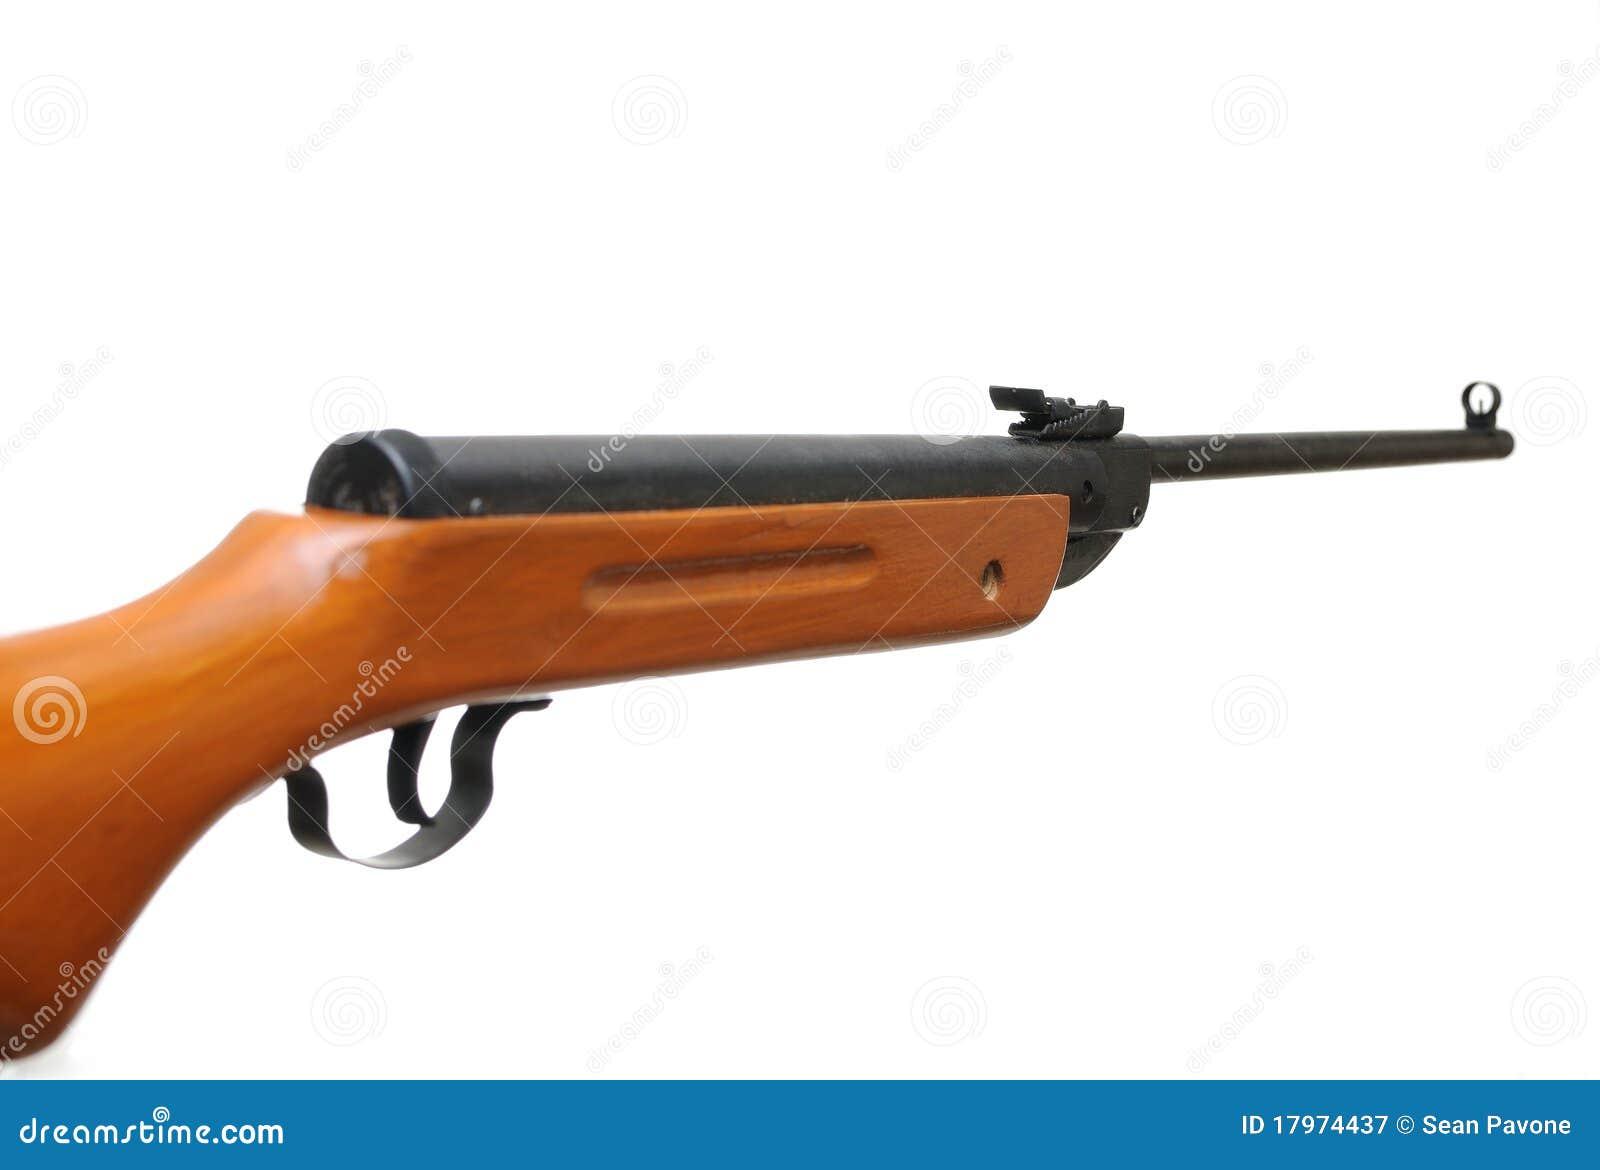 Pellet Gun stock image  Image of guns, barrel, hunt, shoot - 17974437